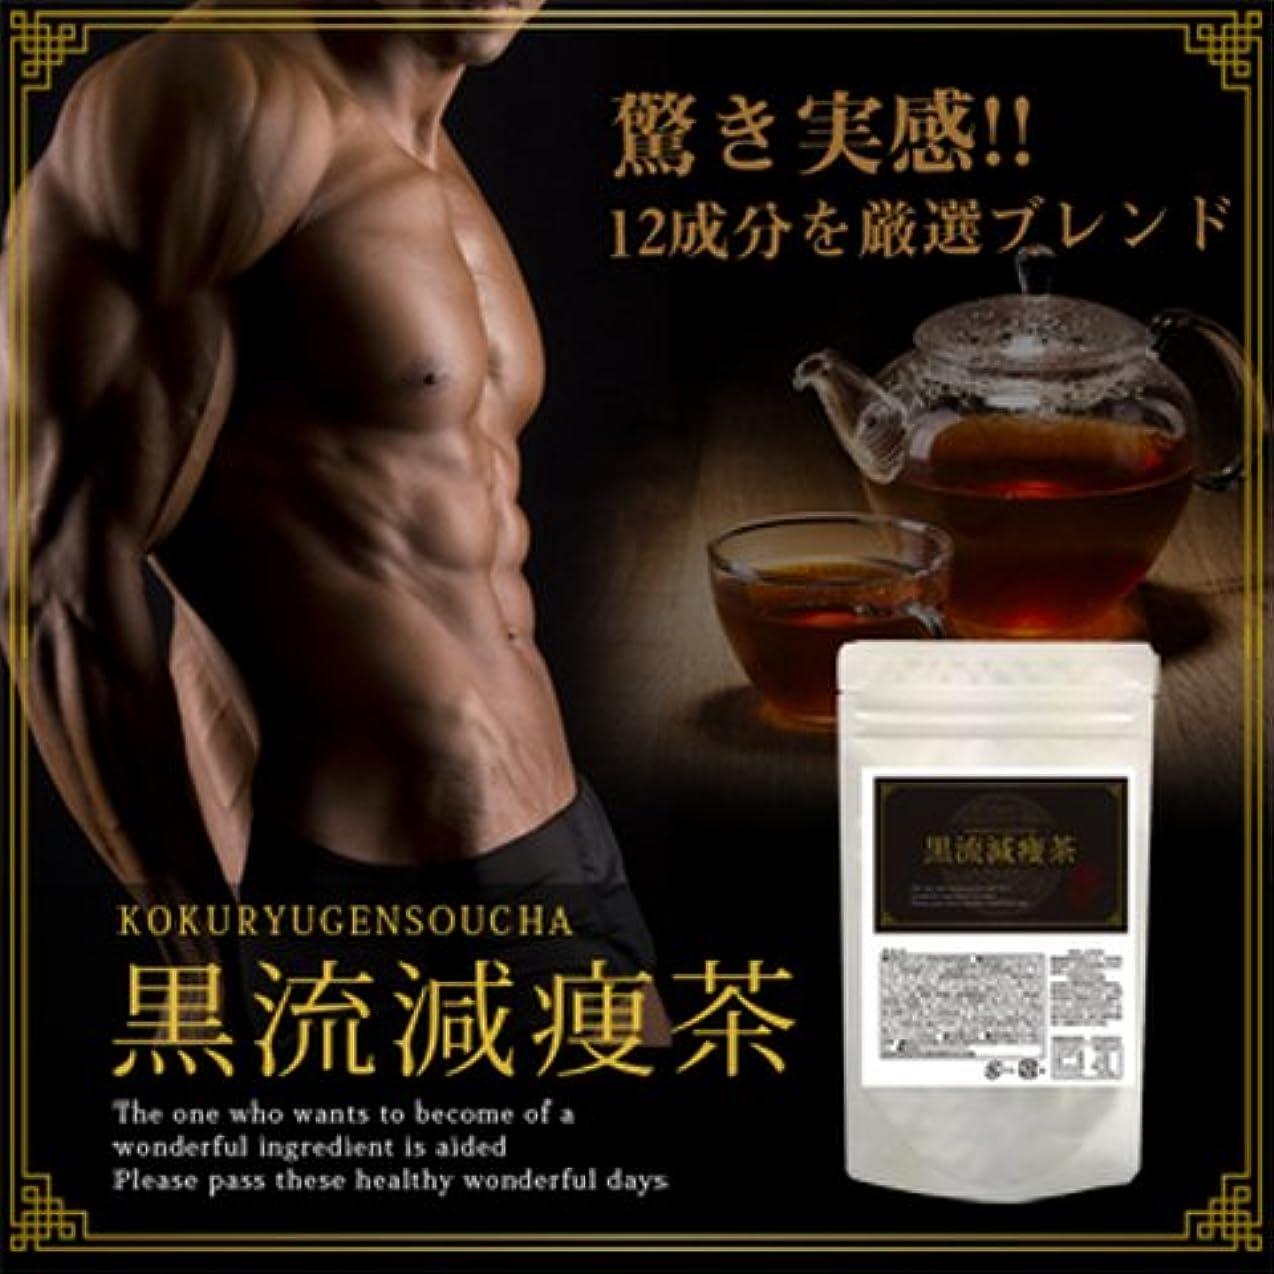 毎月救急車宿る黒流減痩茶 (黄金茶葉厳選12種配合ダイエット茶)